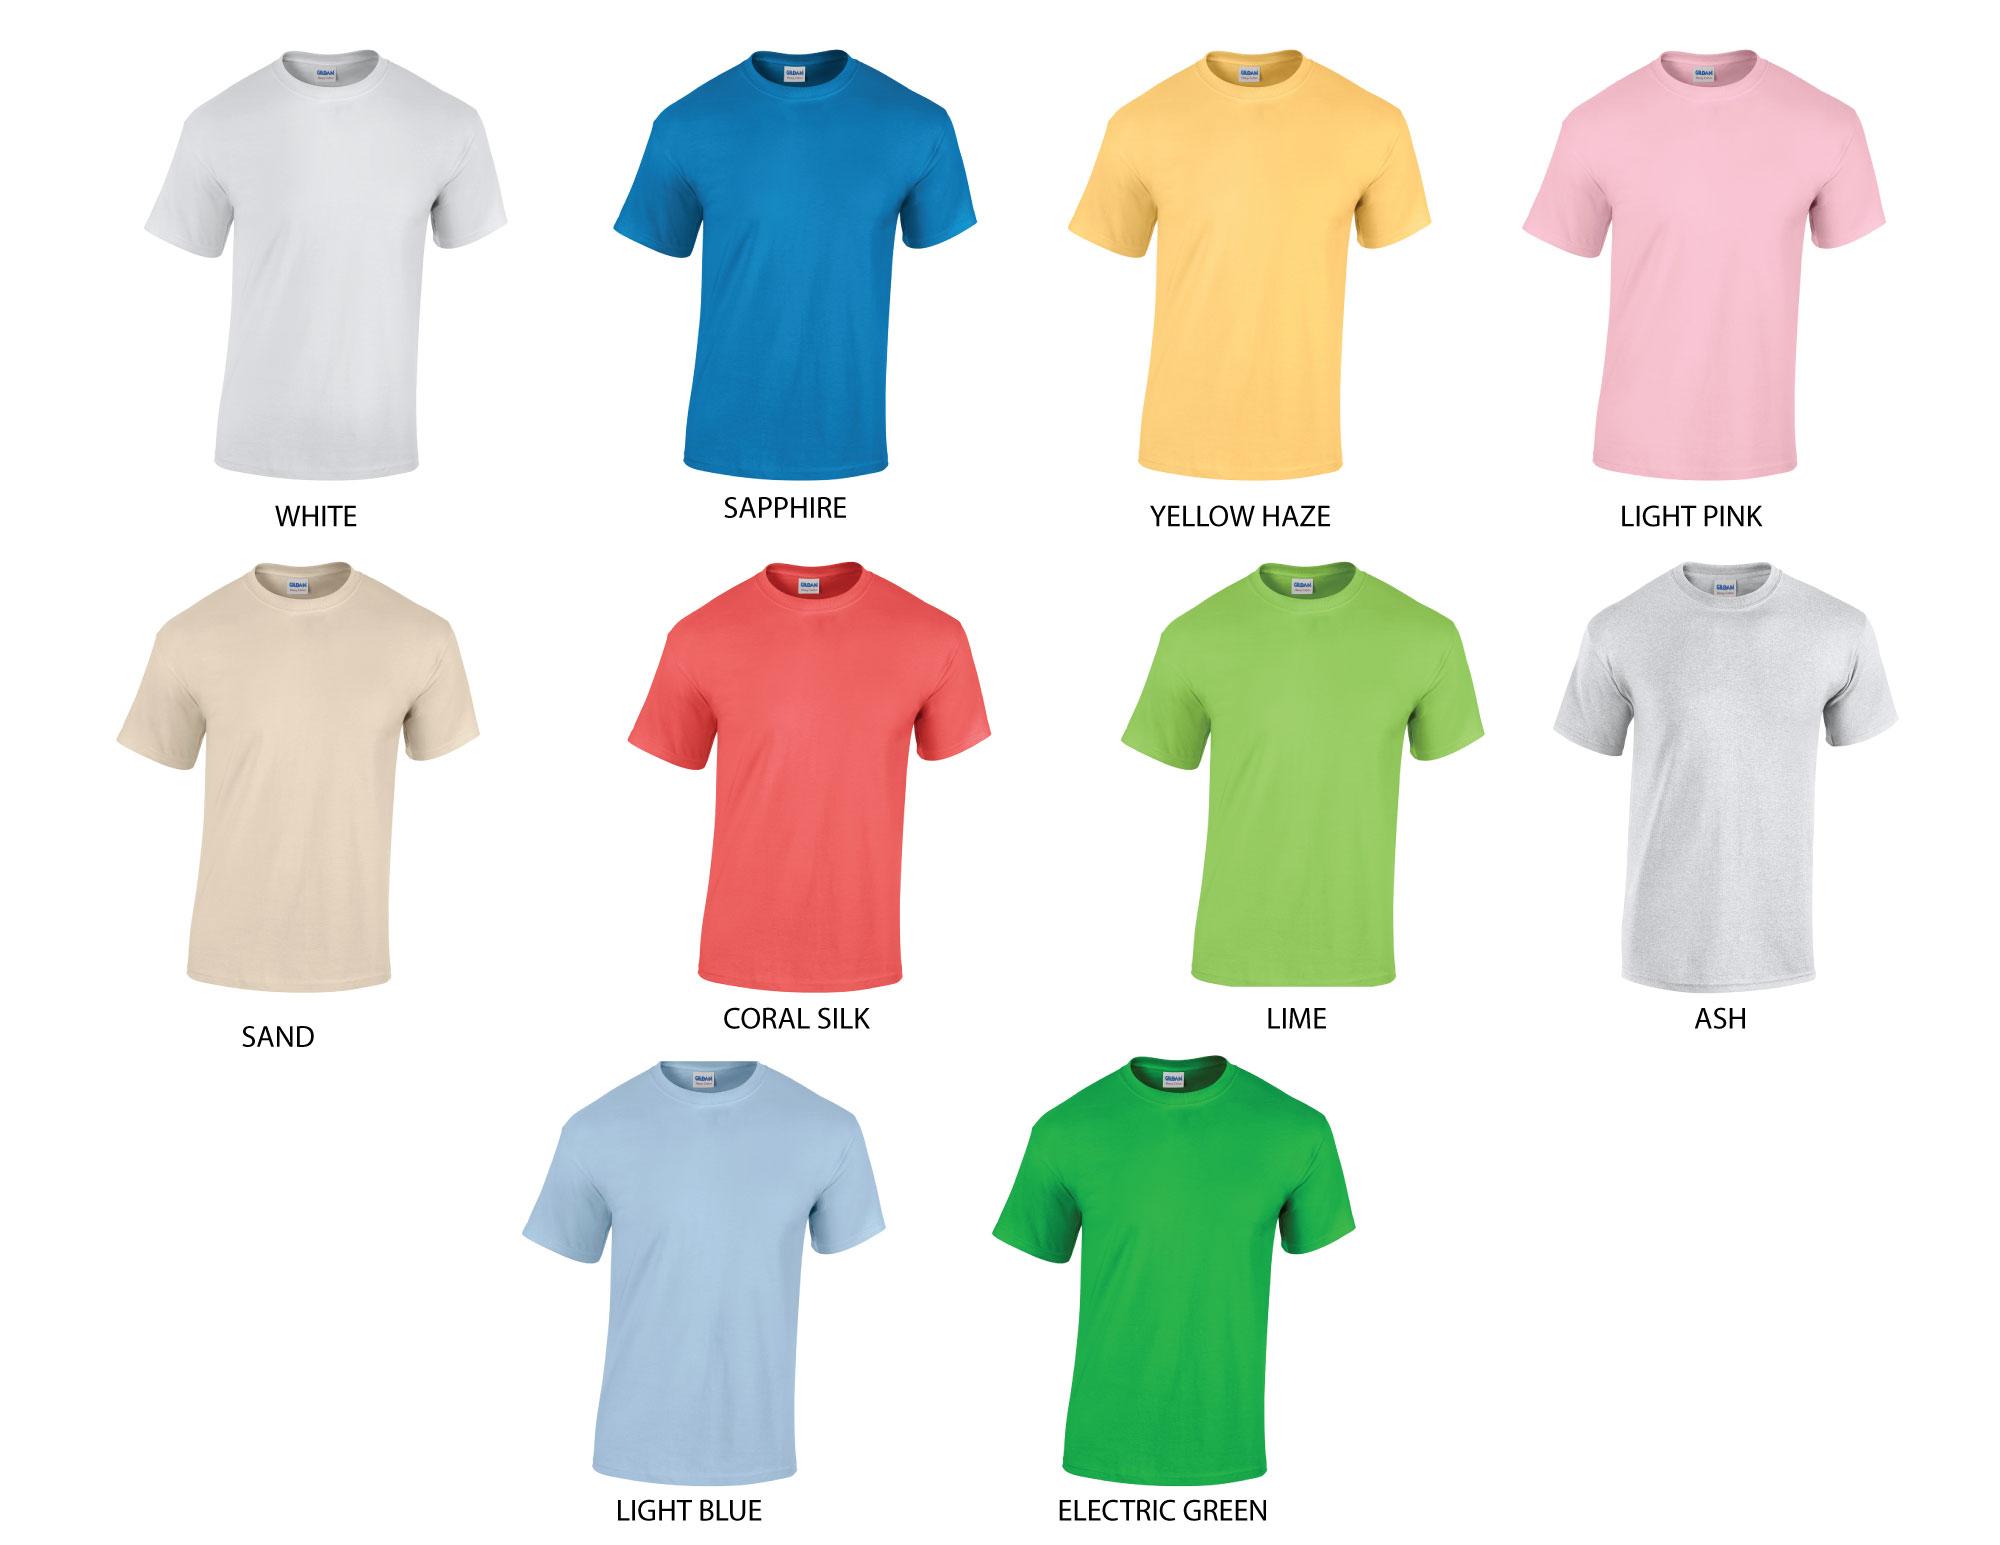 10-Shirt-Color-Offer.jpg